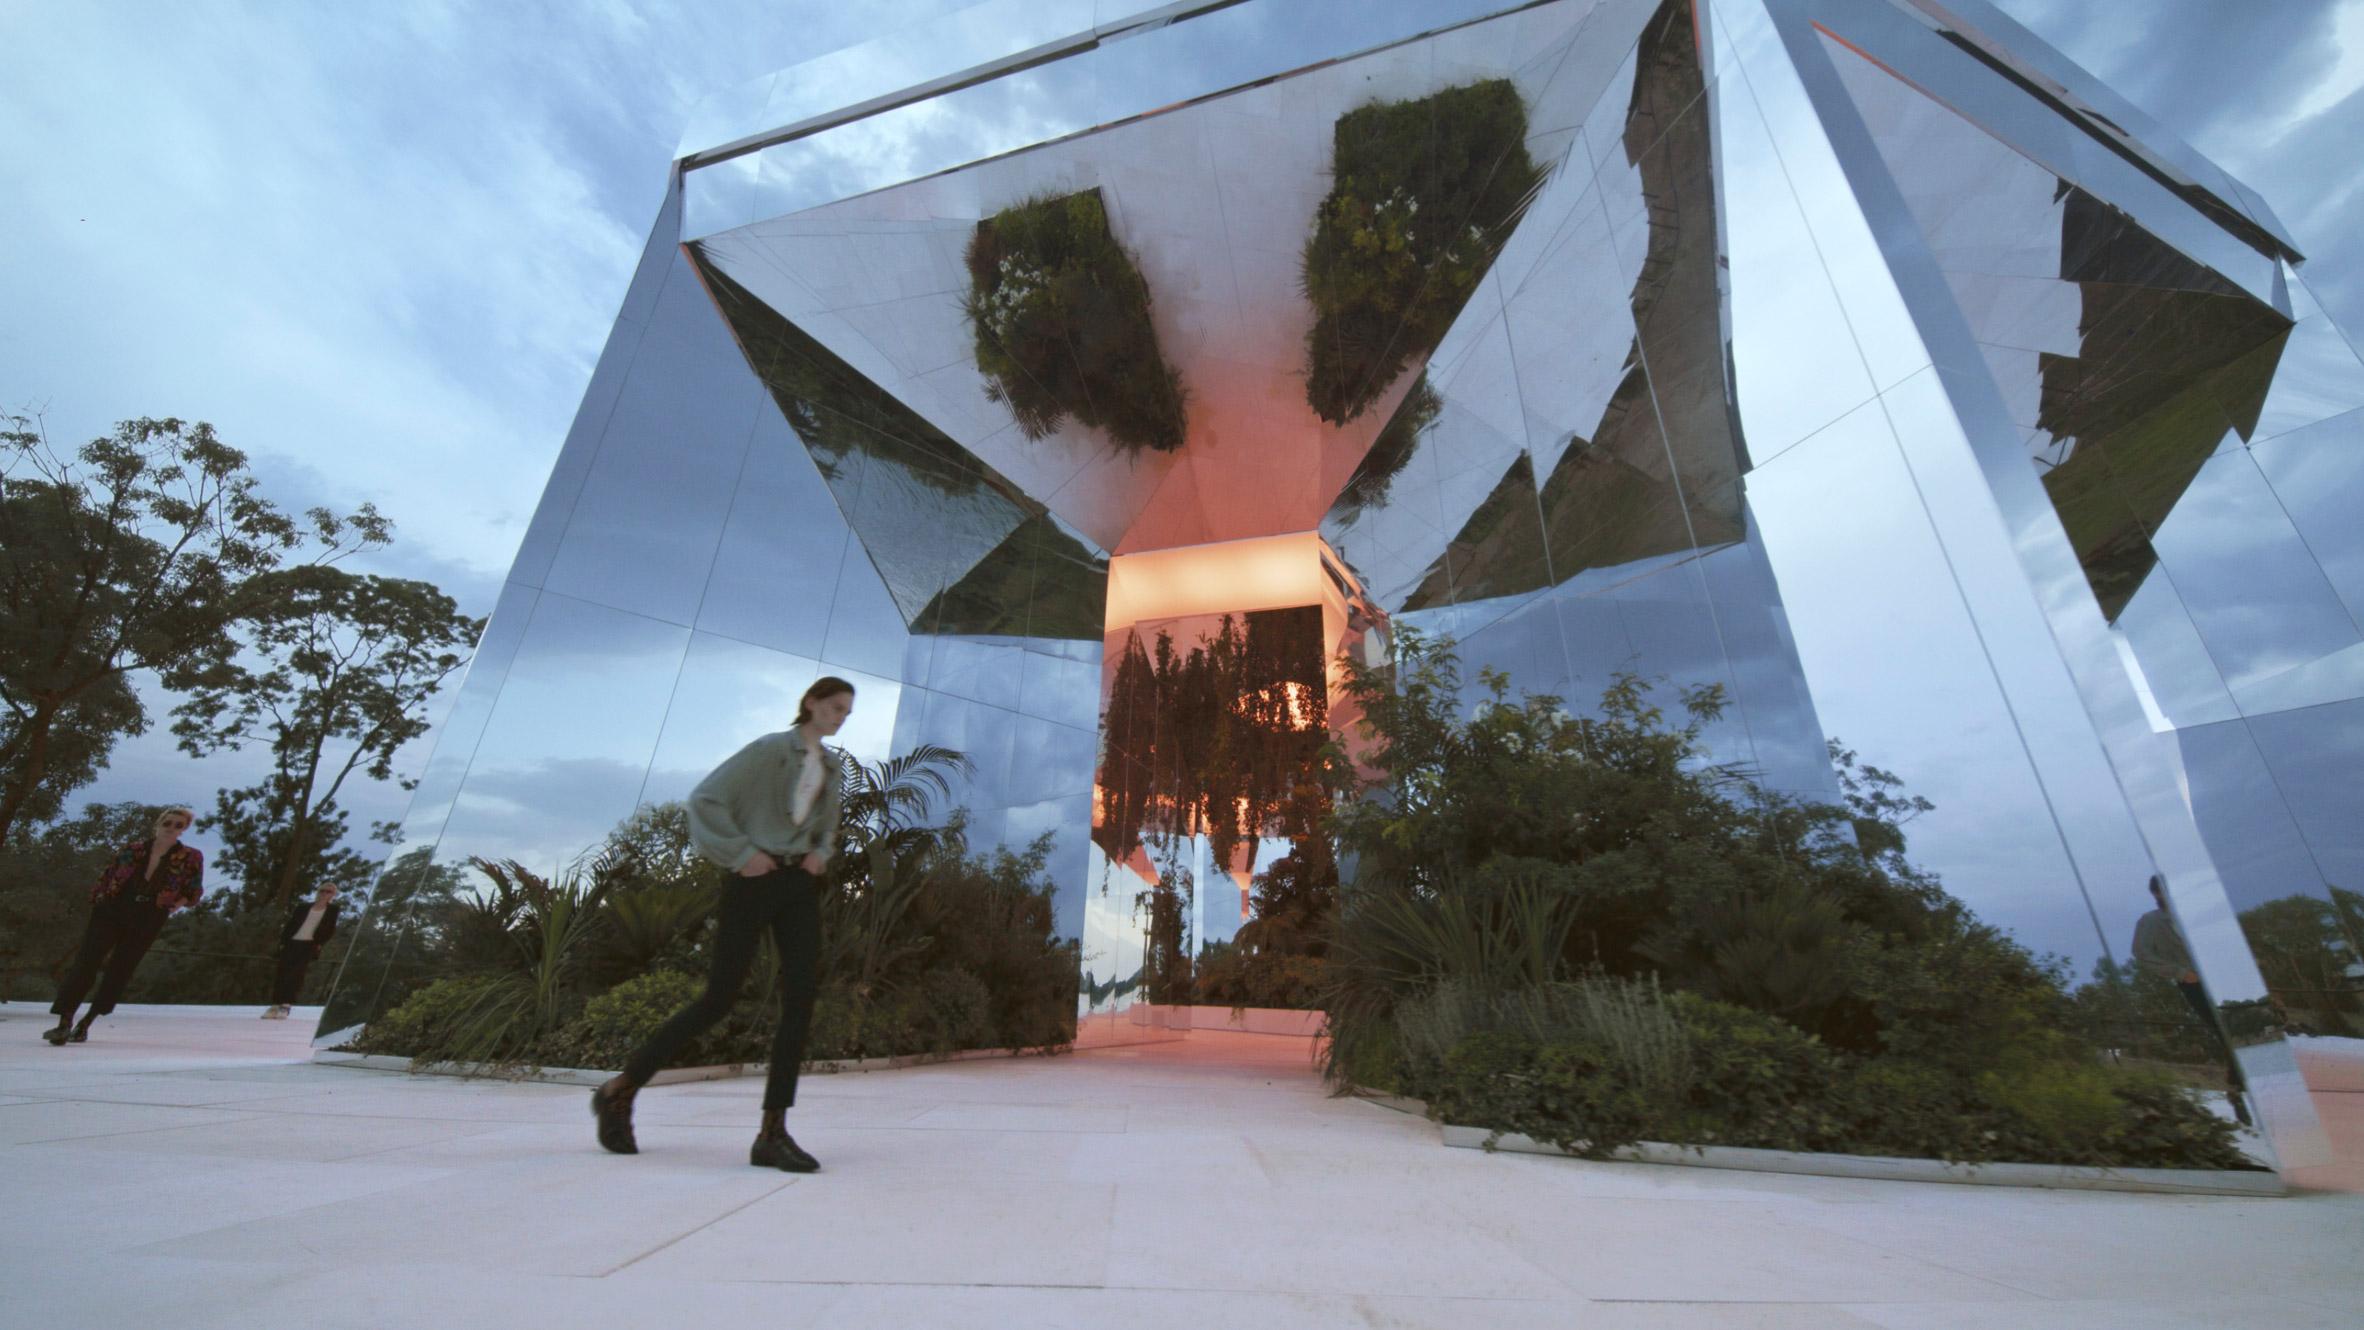 Aitken called his installation Green Lens